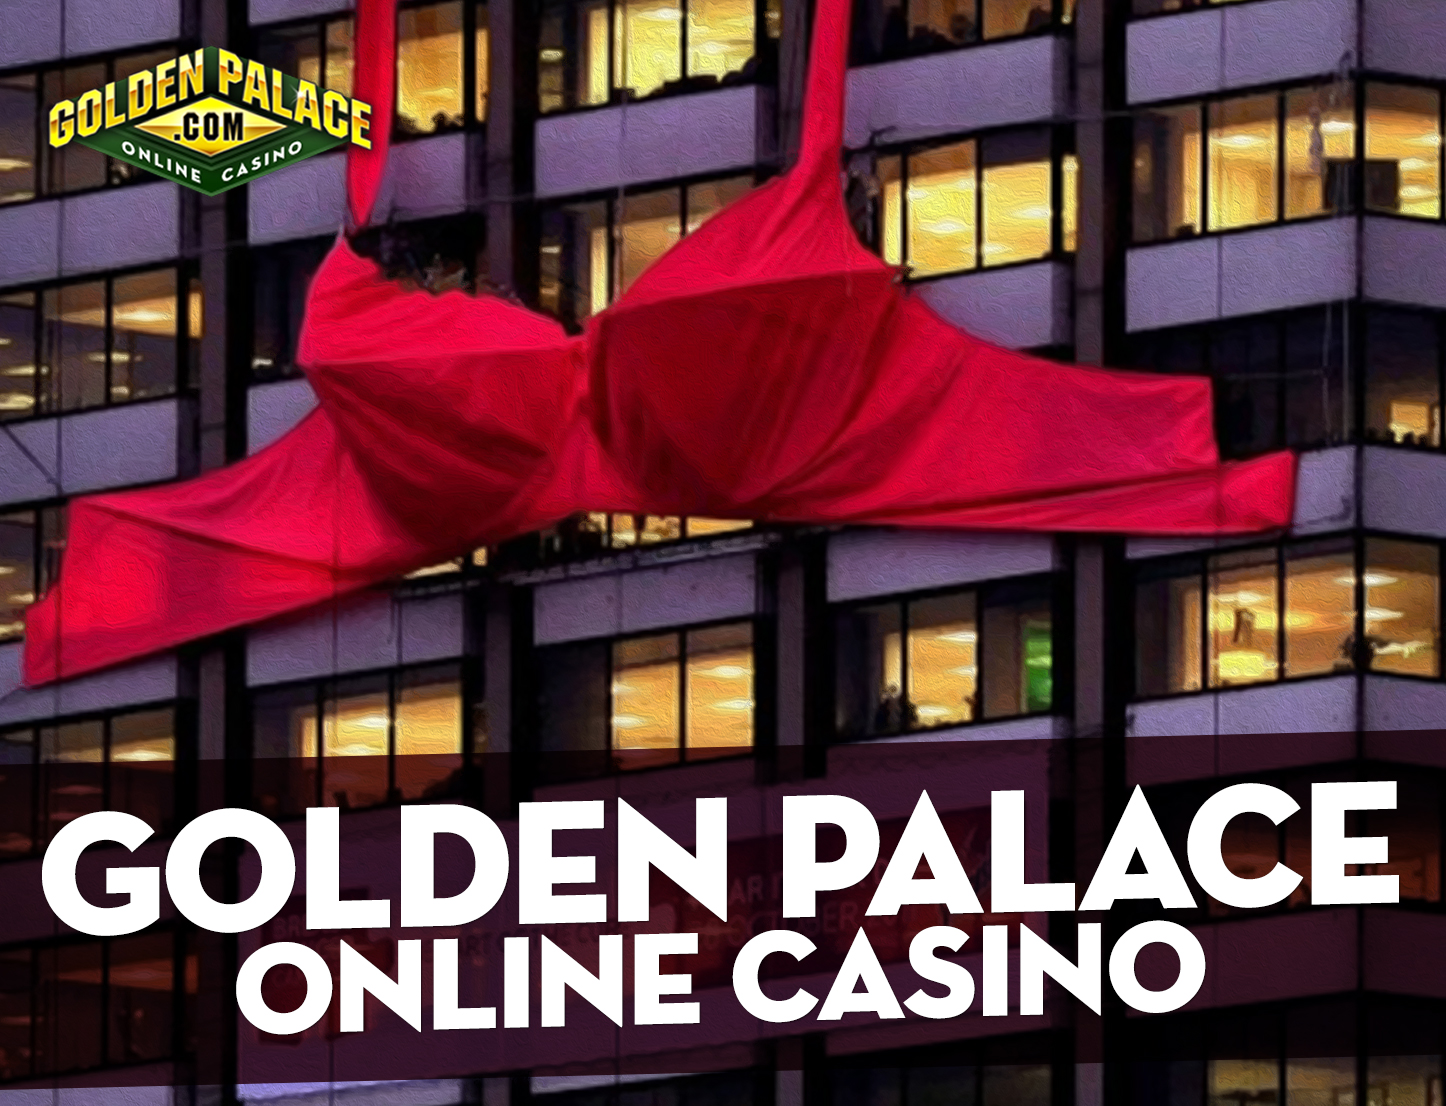 golden palace online casino casino charm